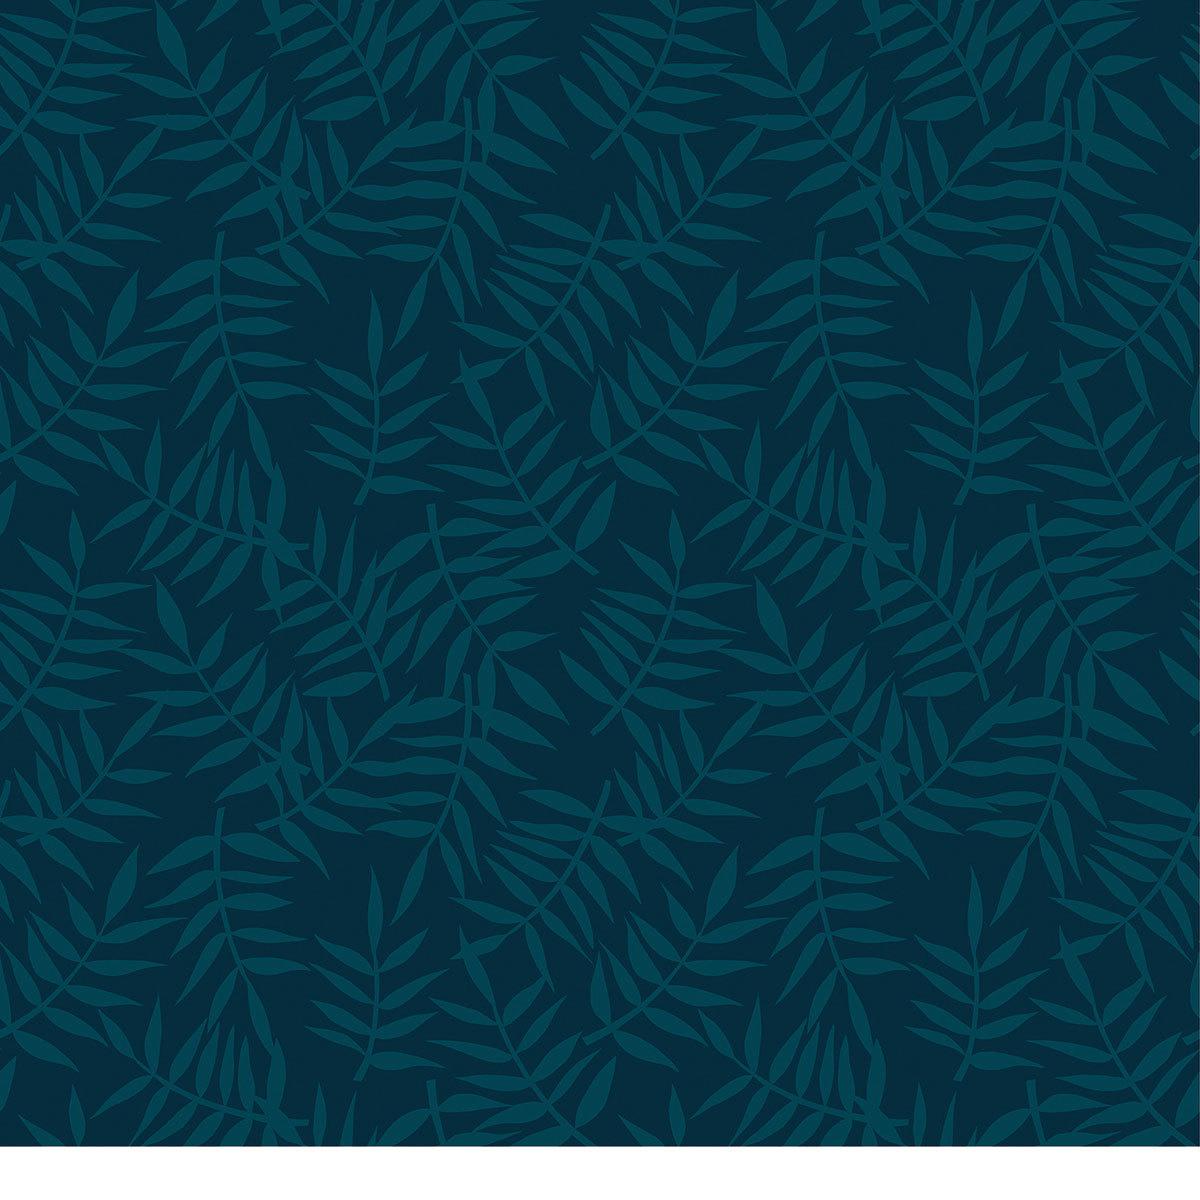 lilipinso tropica papier peint motif feuillage tropical bleu papier peint lilipinso sur l. Black Bedroom Furniture Sets. Home Design Ideas